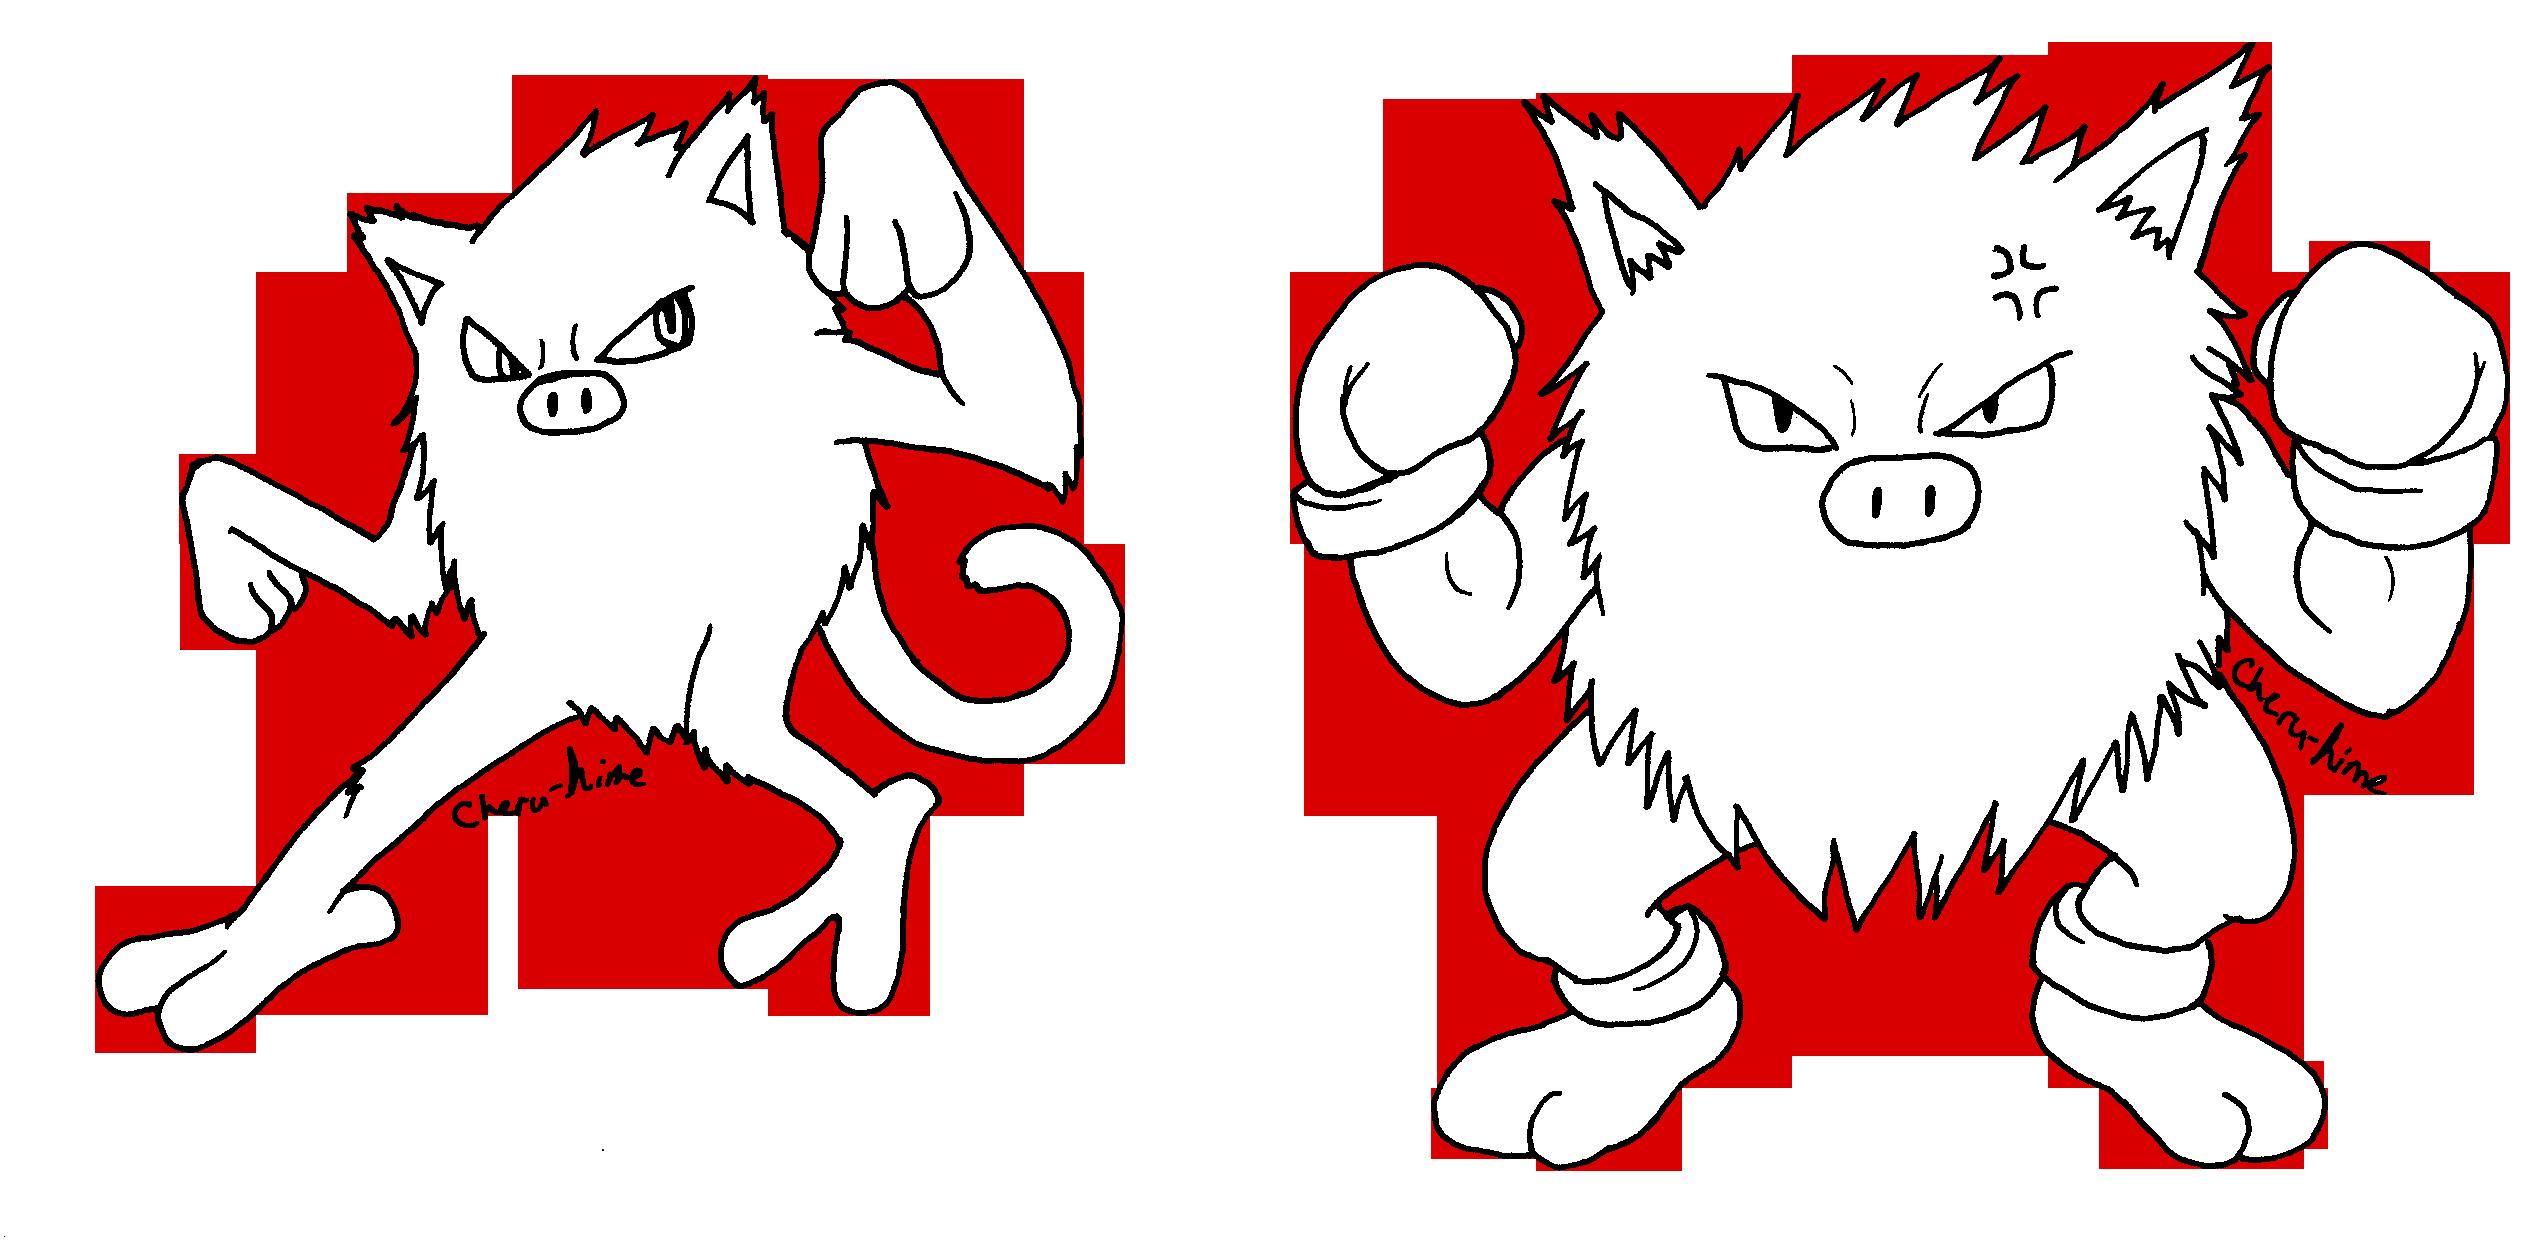 Pokemon lineart: MANKEY PRIMAPE by Cheru-Hime on DeviantArt